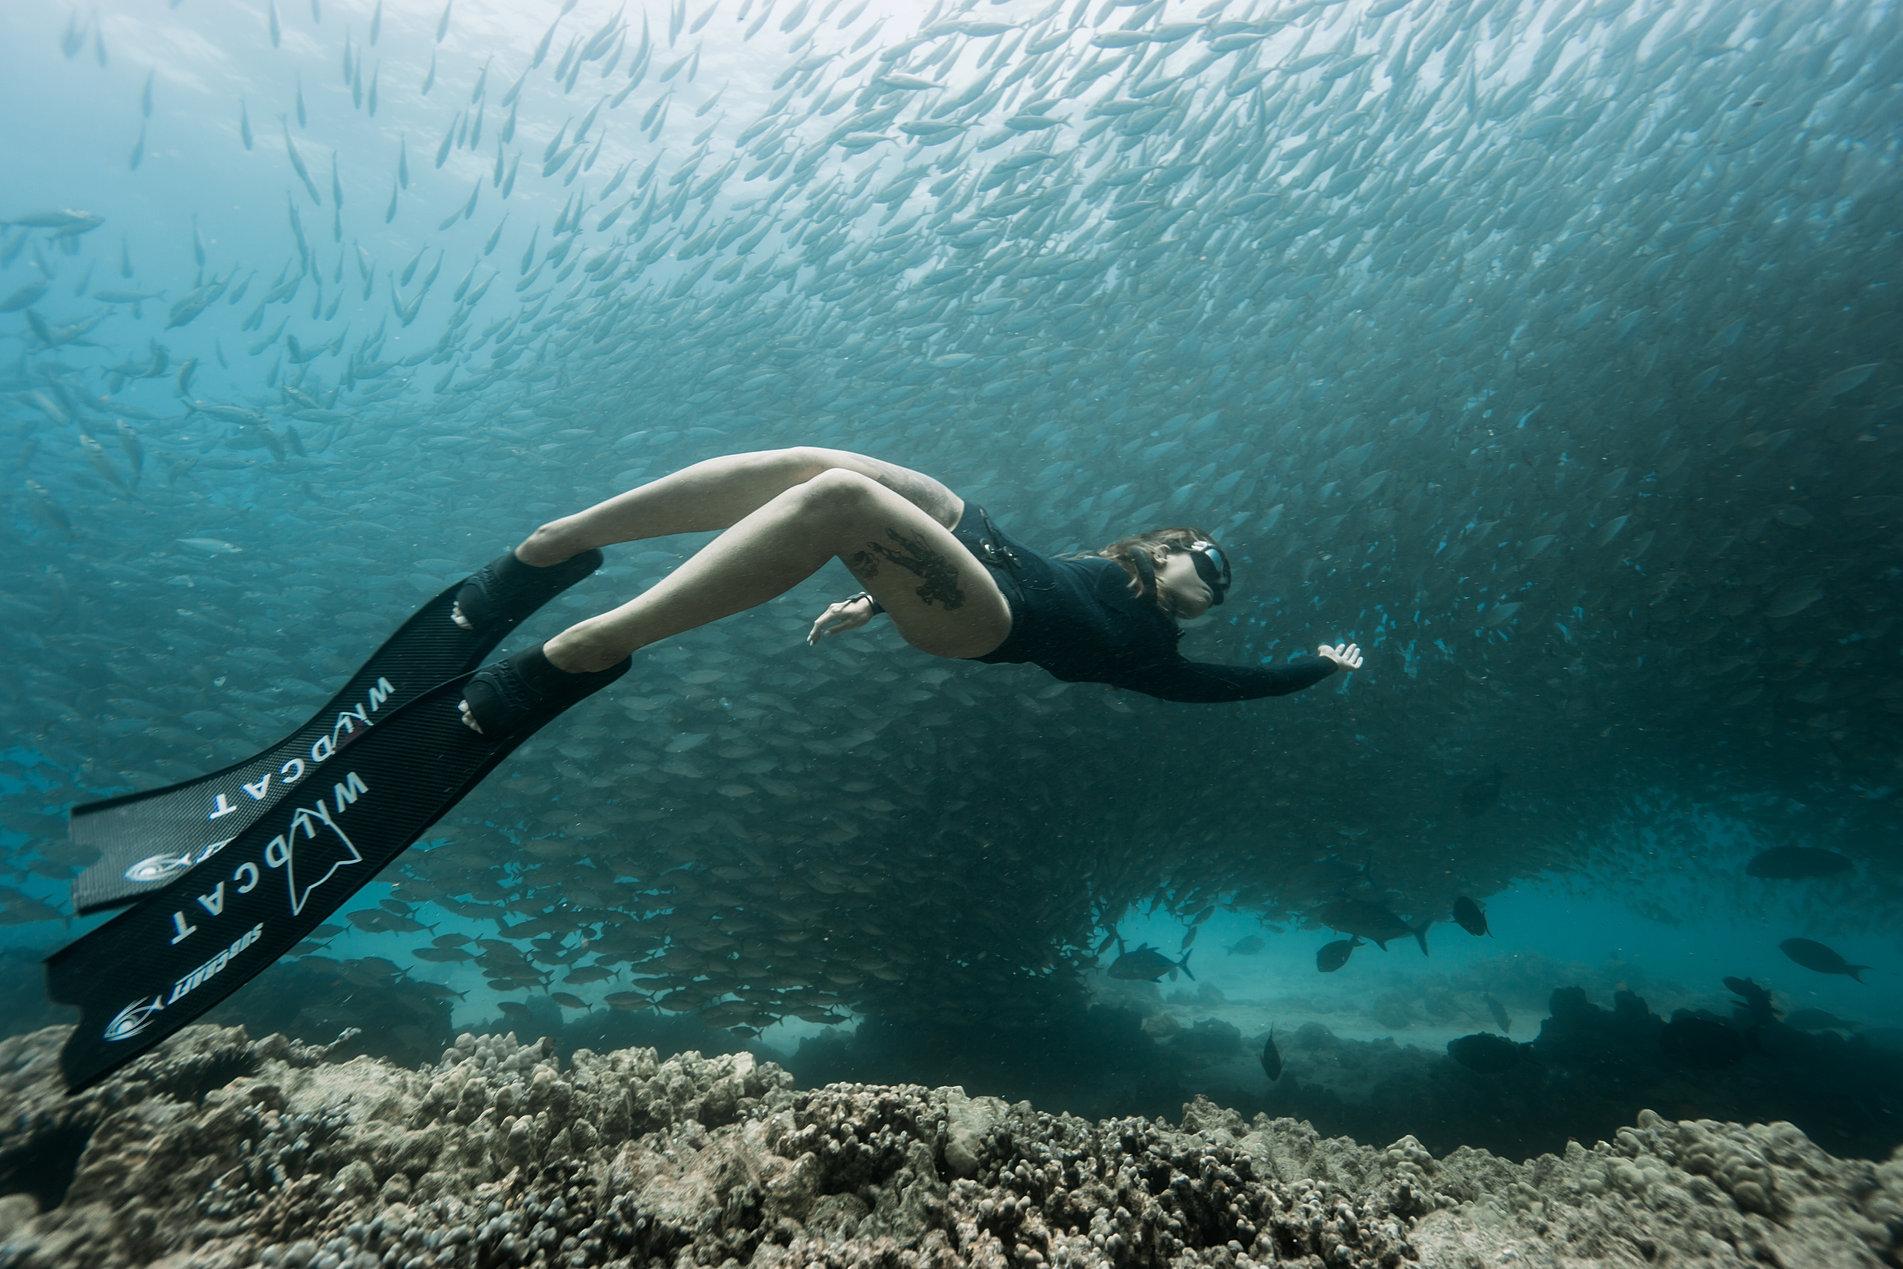 Deep freediving instruction - Porno dive video gratis ...